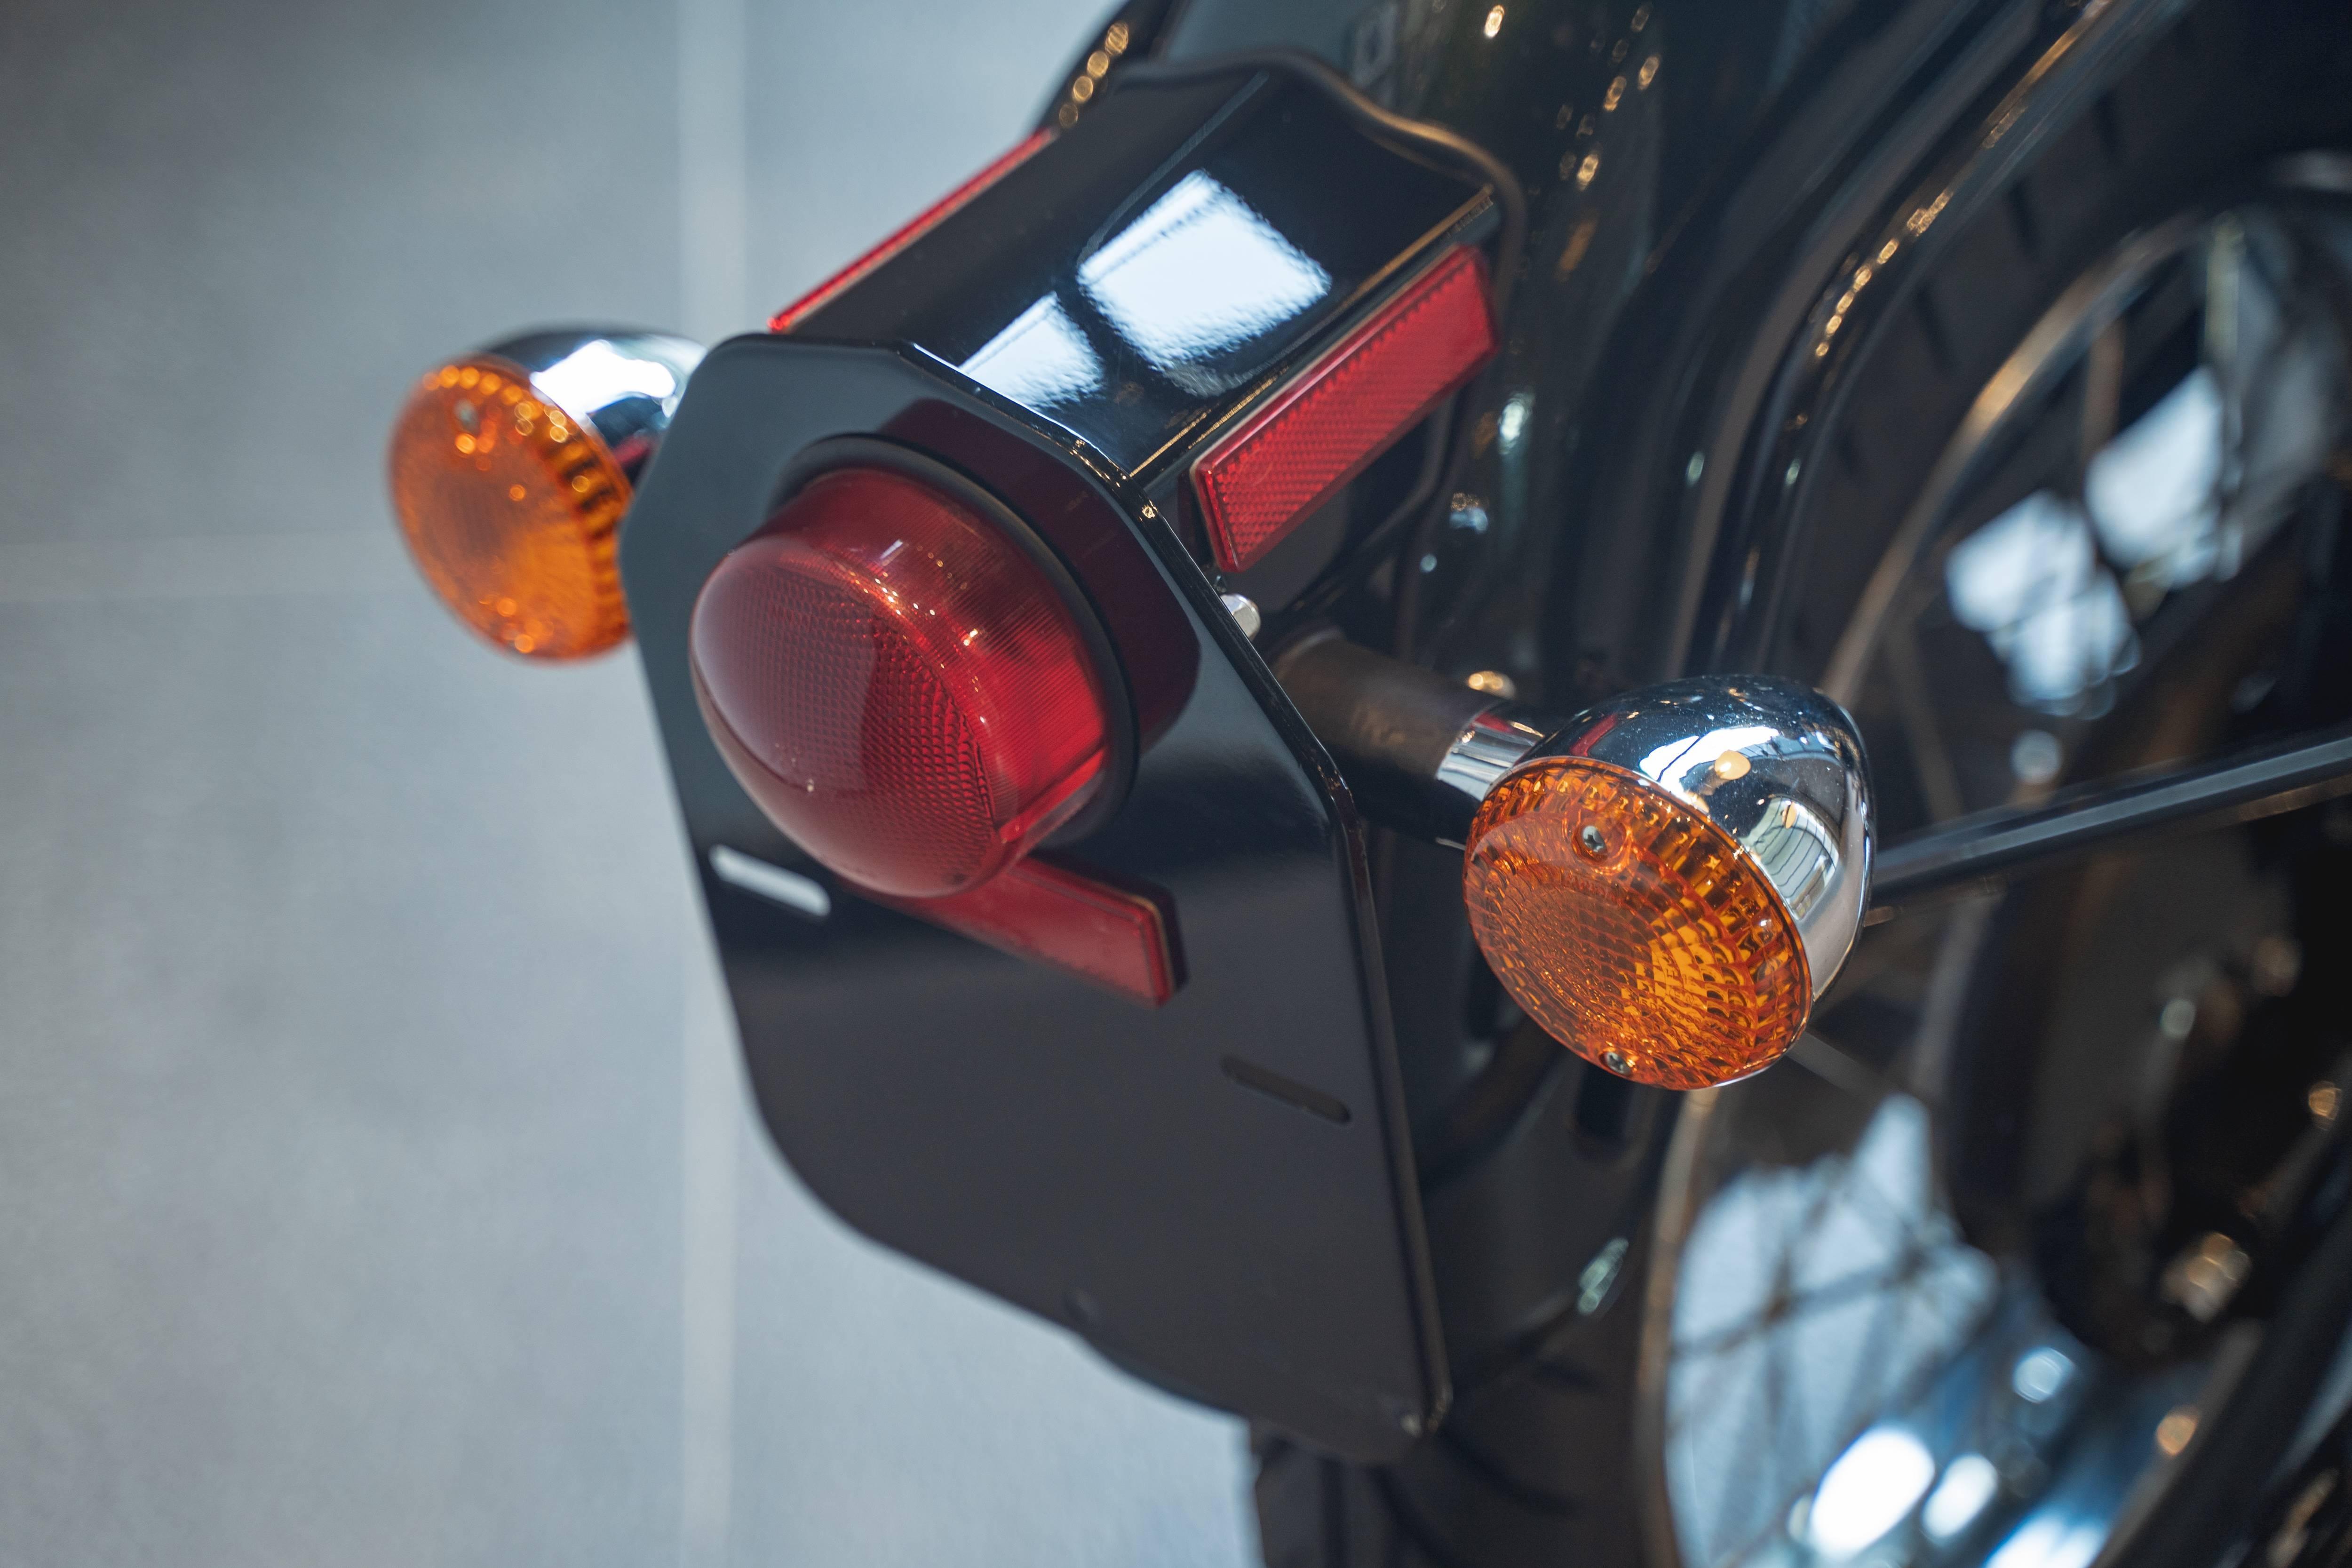 moto 500 cc anh 7